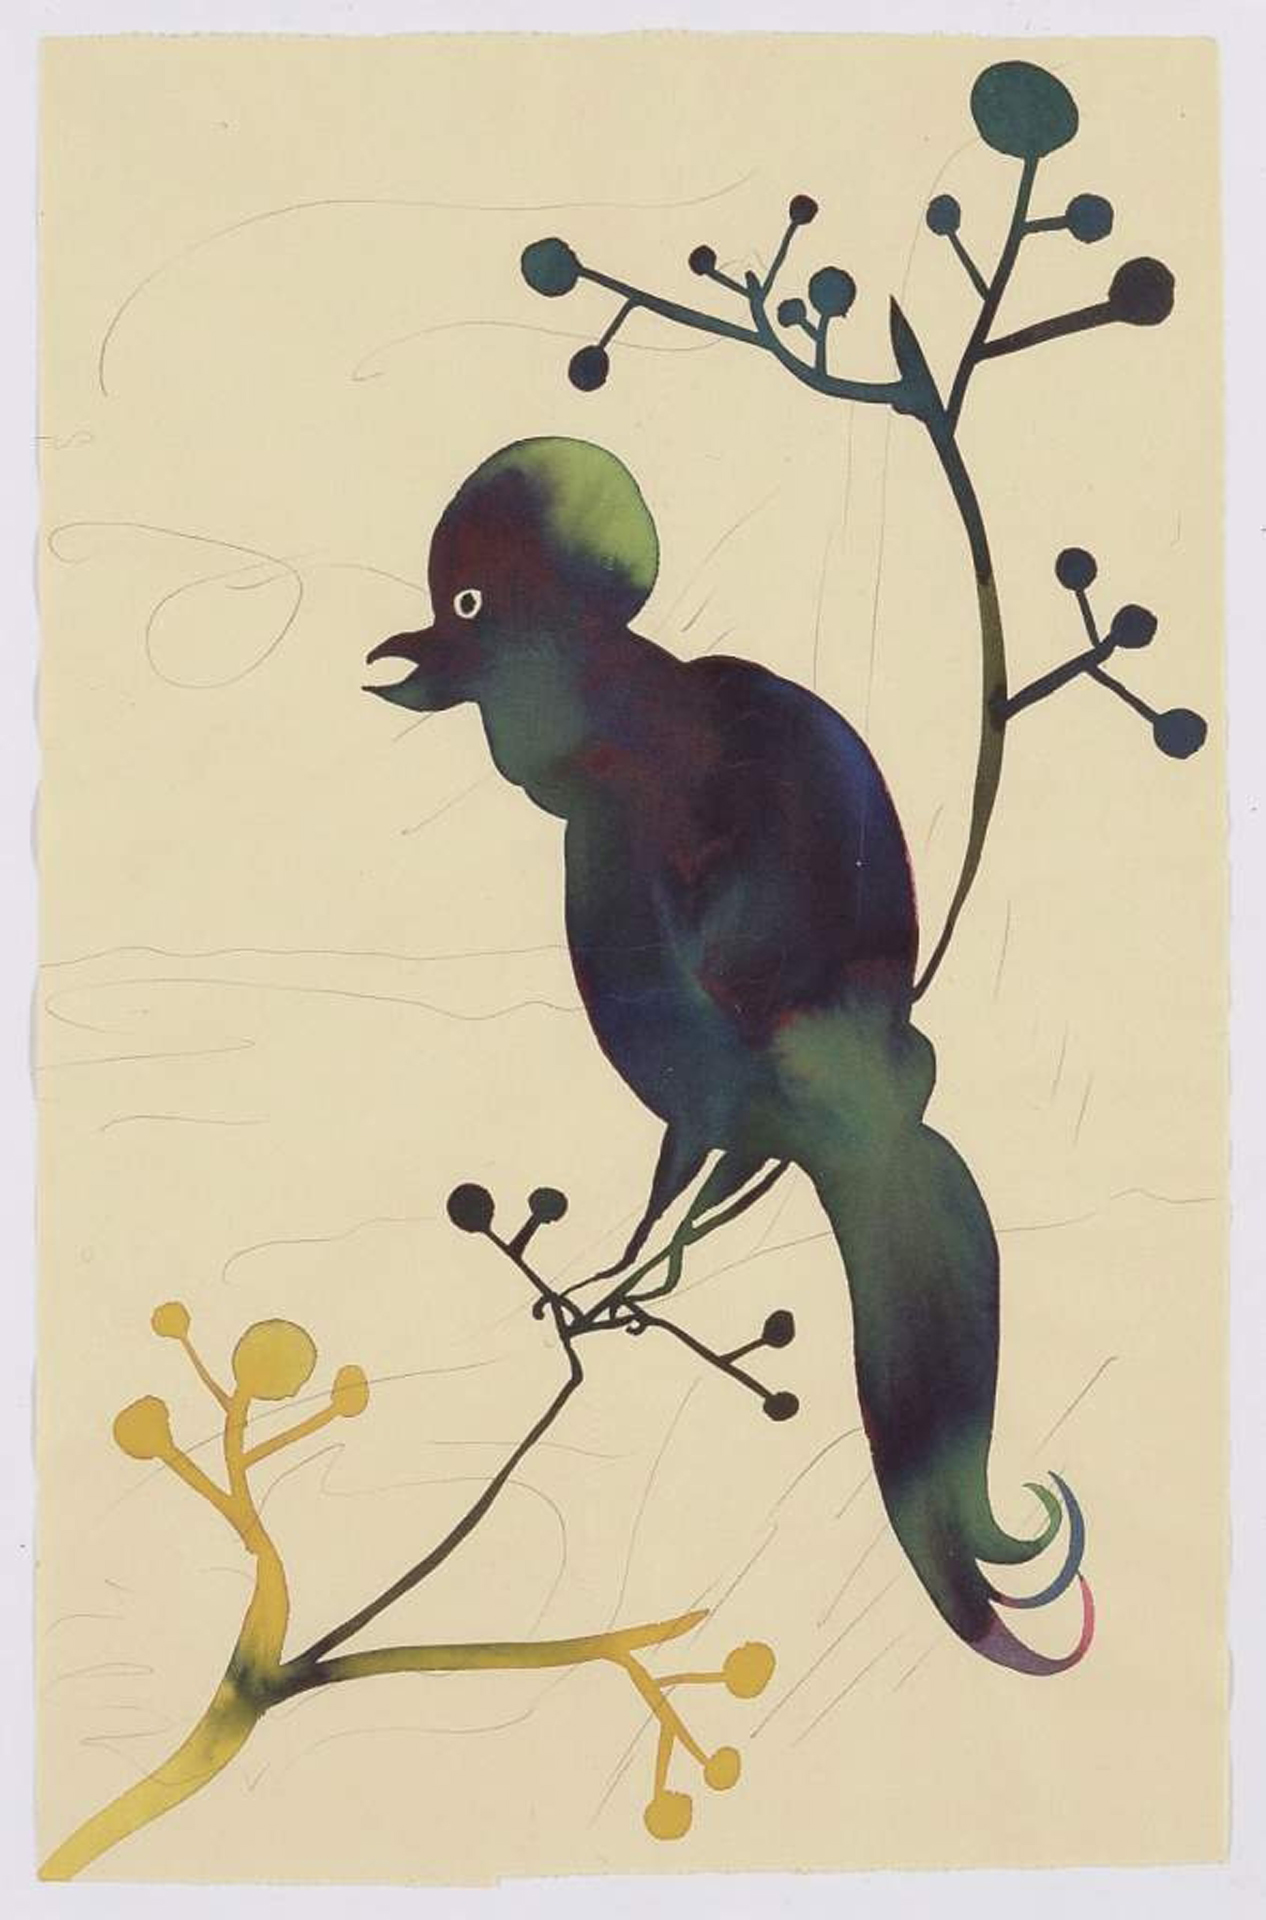 Chris Ofili, Ohne Titel, 2004, Aquarell und Bleistift auf Papier, 32,5 x 21 cm